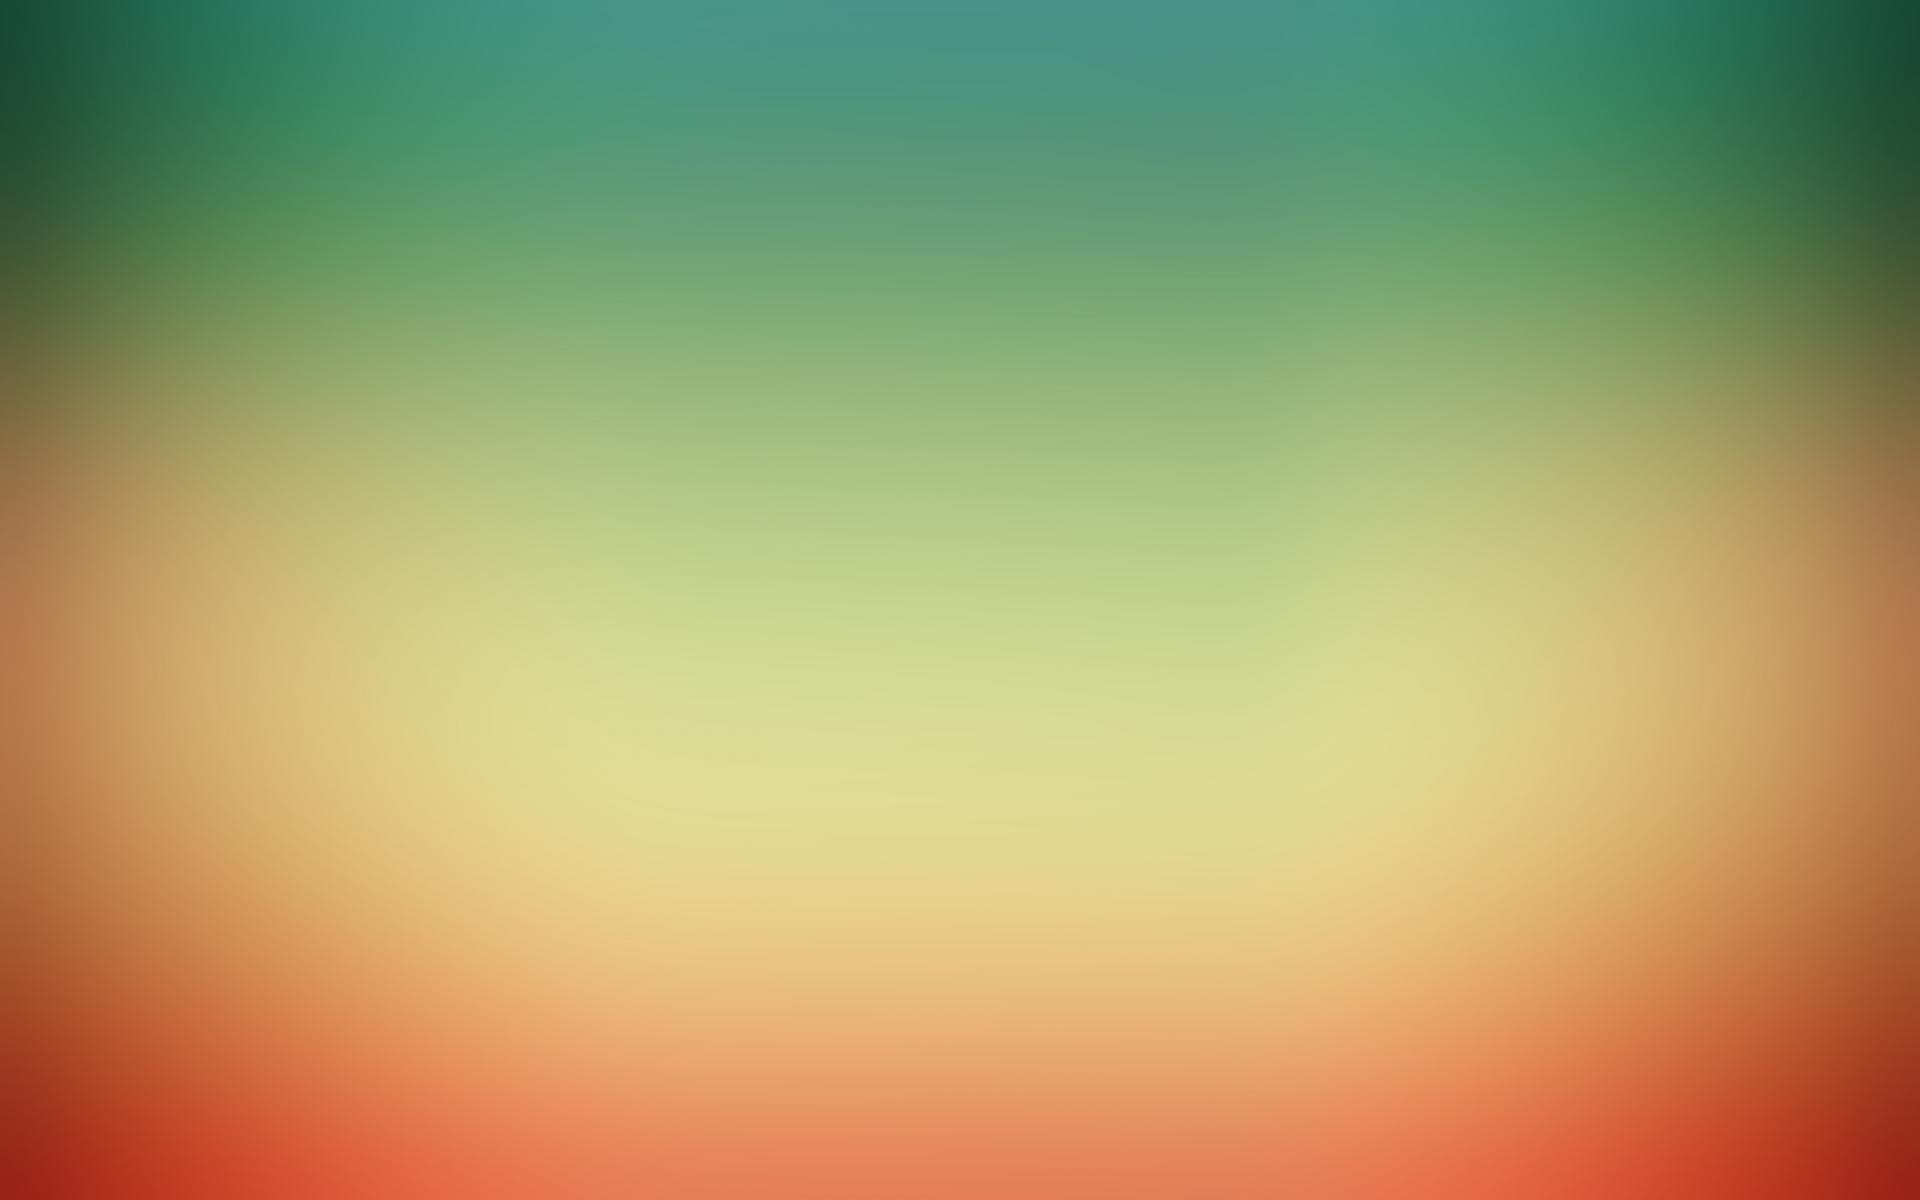 Cool Gradient Wallpaper 26040 1920x1200 Px